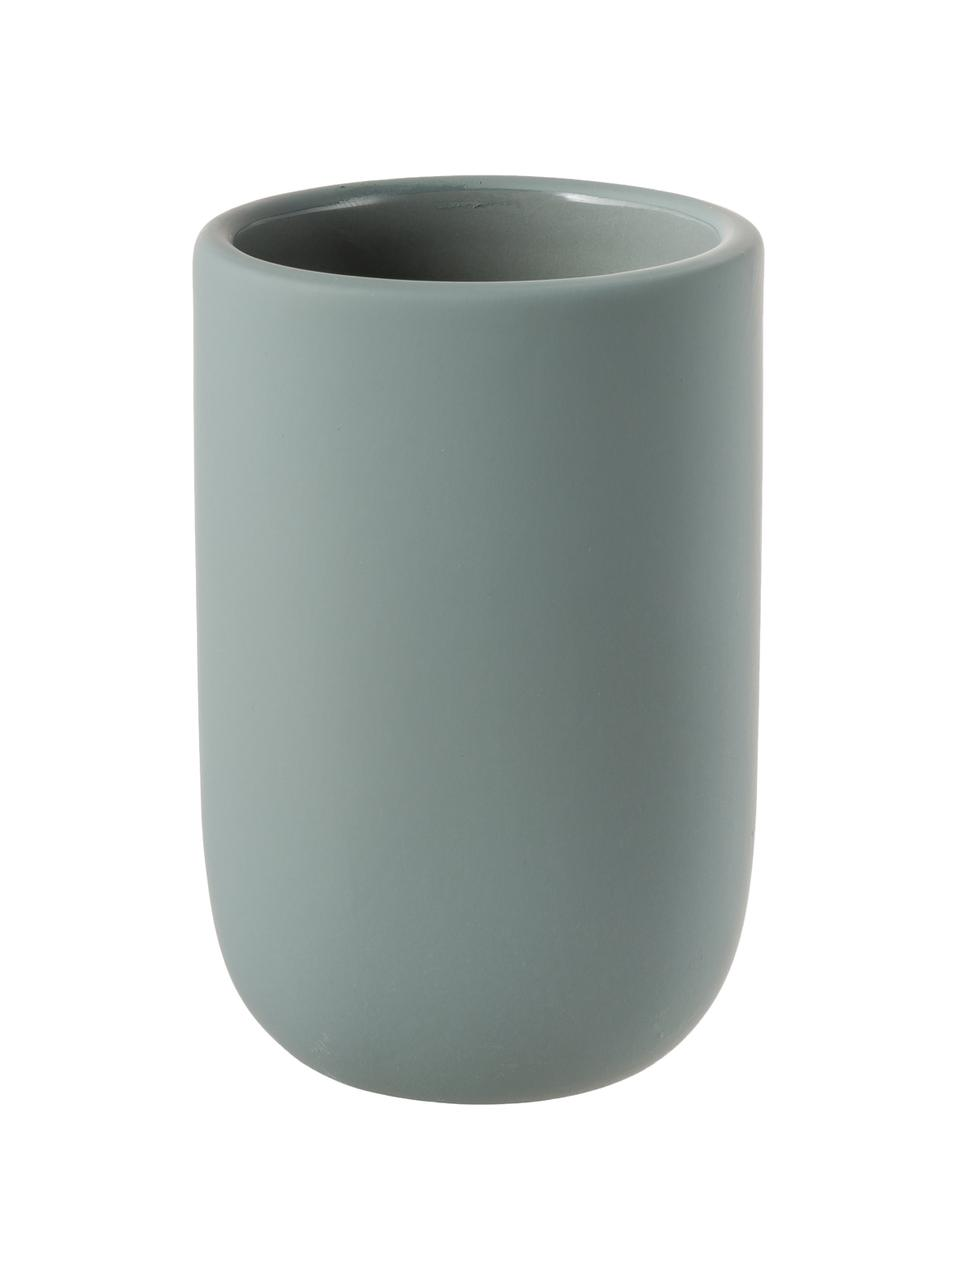 Keramik-Zahnputzbecher Lotus, Keramik, Grün, Ø 7 x H 10 cm